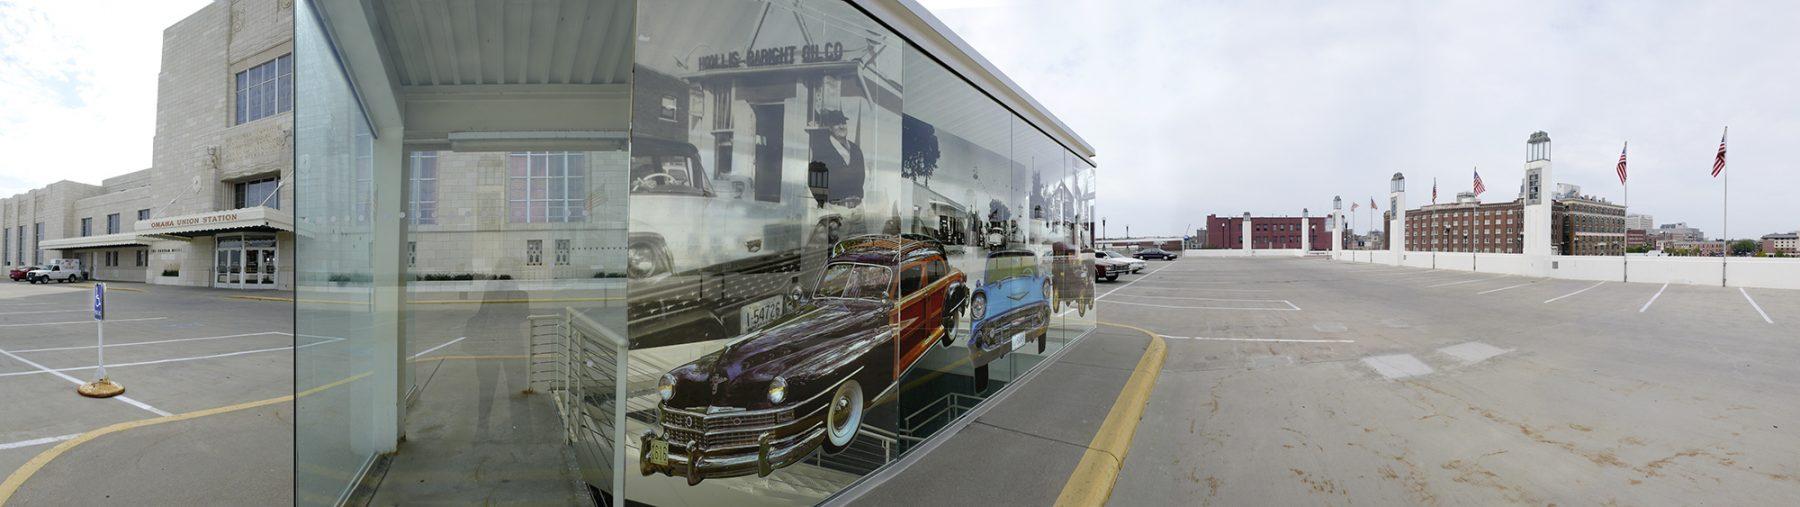 Omaha, Nebraska, Durham Museum